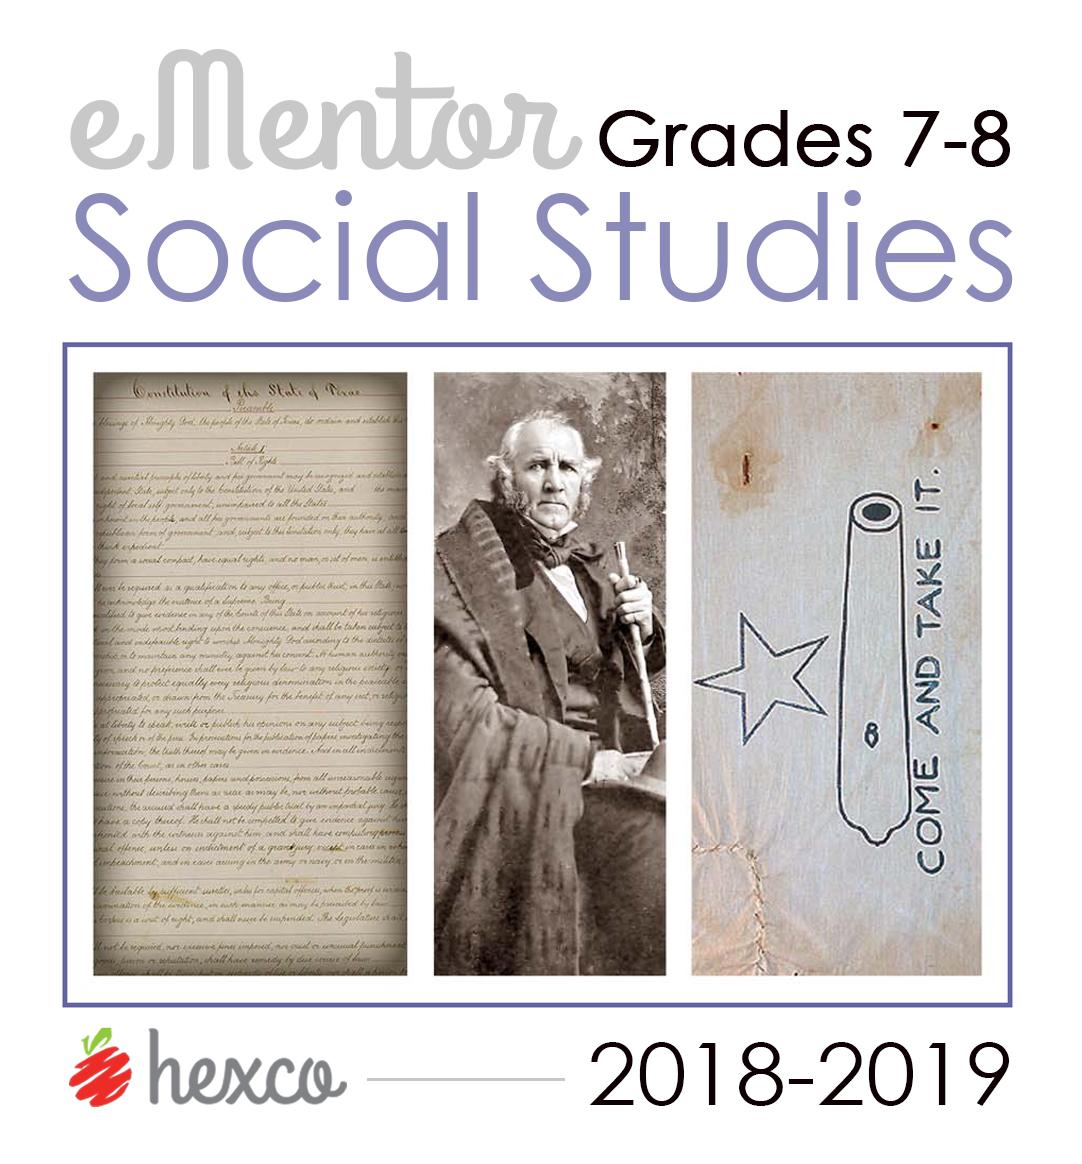 uil-social-studies-ementor-grades-7-8-a-psia.jpg